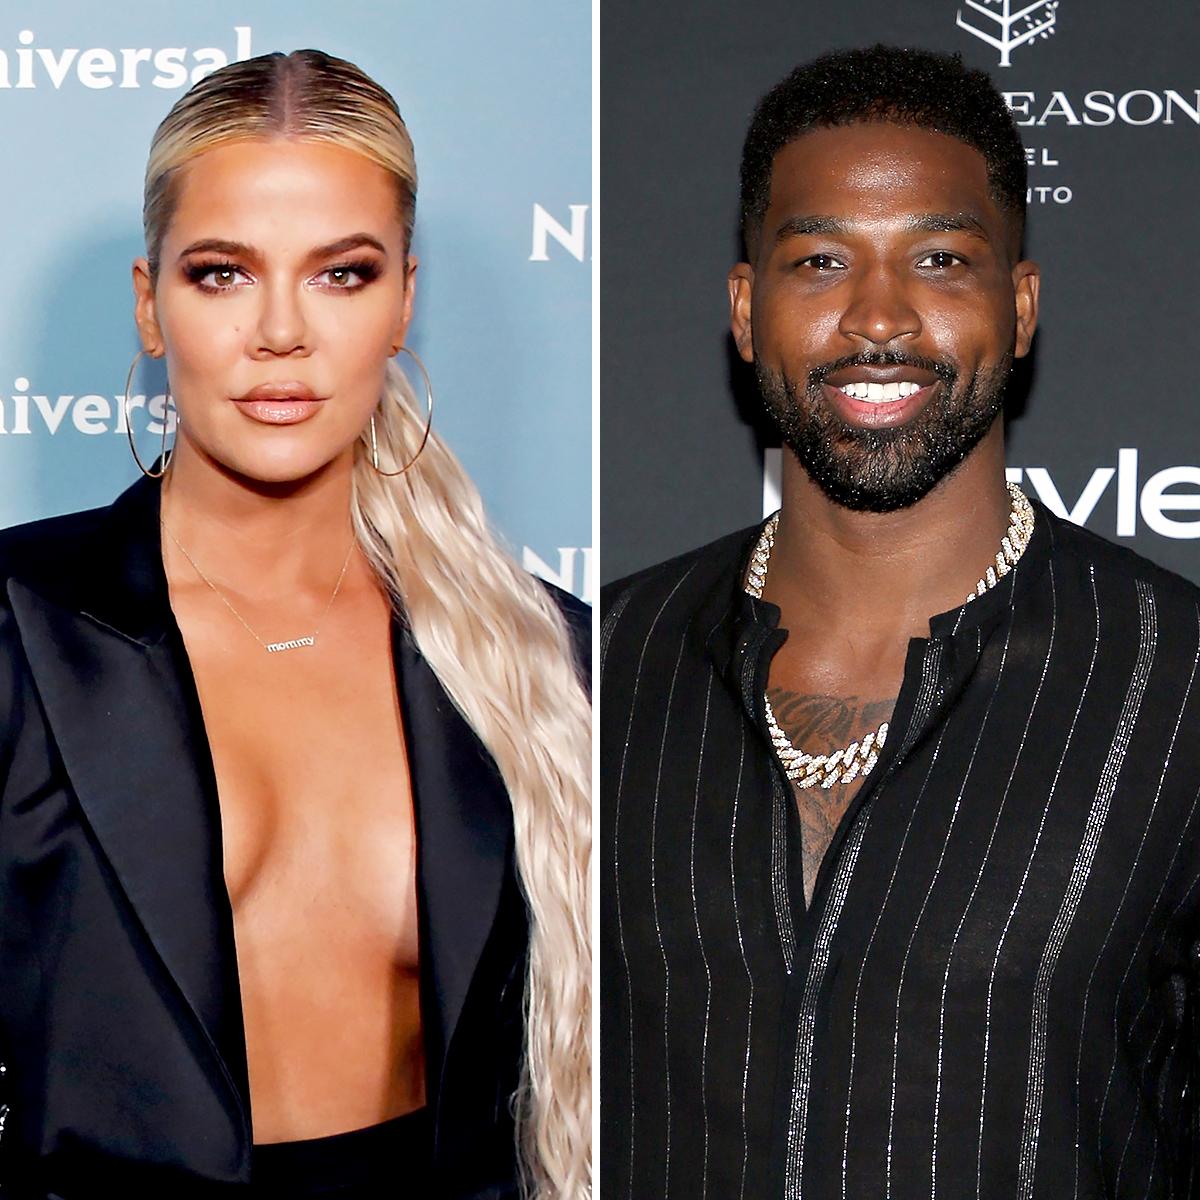 c880c9a21bf Khloe Kardashian Addresses 'Raw' Split From Tristan Thompson